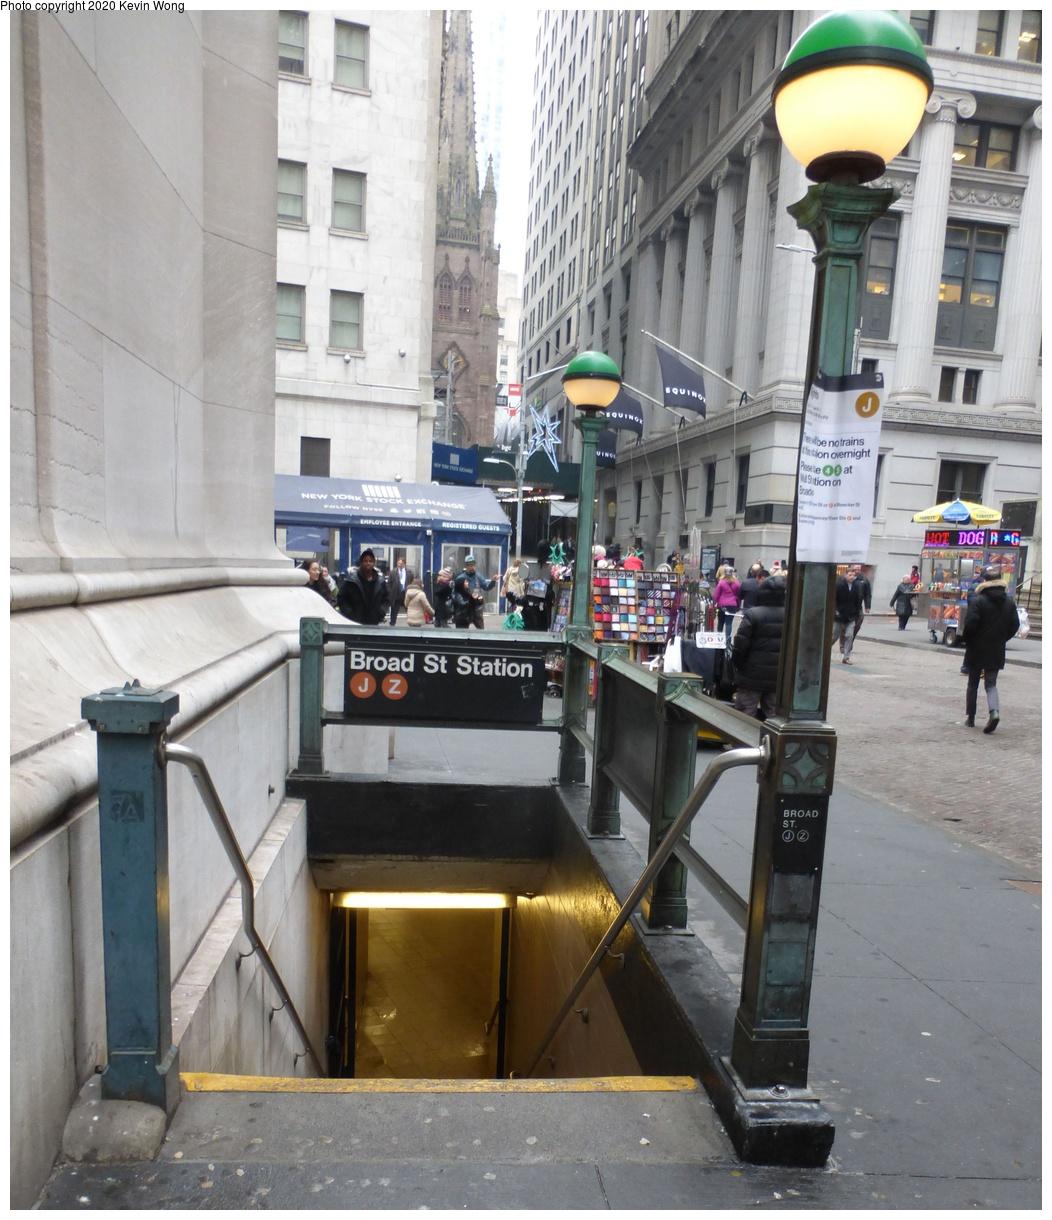 (458k, 1052x1220)<br><b>Country:</b> United States<br><b>City:</b> New York<br><b>System:</b> New York City Transit<br><b>Line:</b> BMT Nassau Street-Jamaica Line<br><b>Location:</b> Broad Street<br><b>Photo by:</b> Kevin Wong<br><b>Date:</b> 1/18/2019<br><b>Viewed (this week/total):</b> 2 / 345